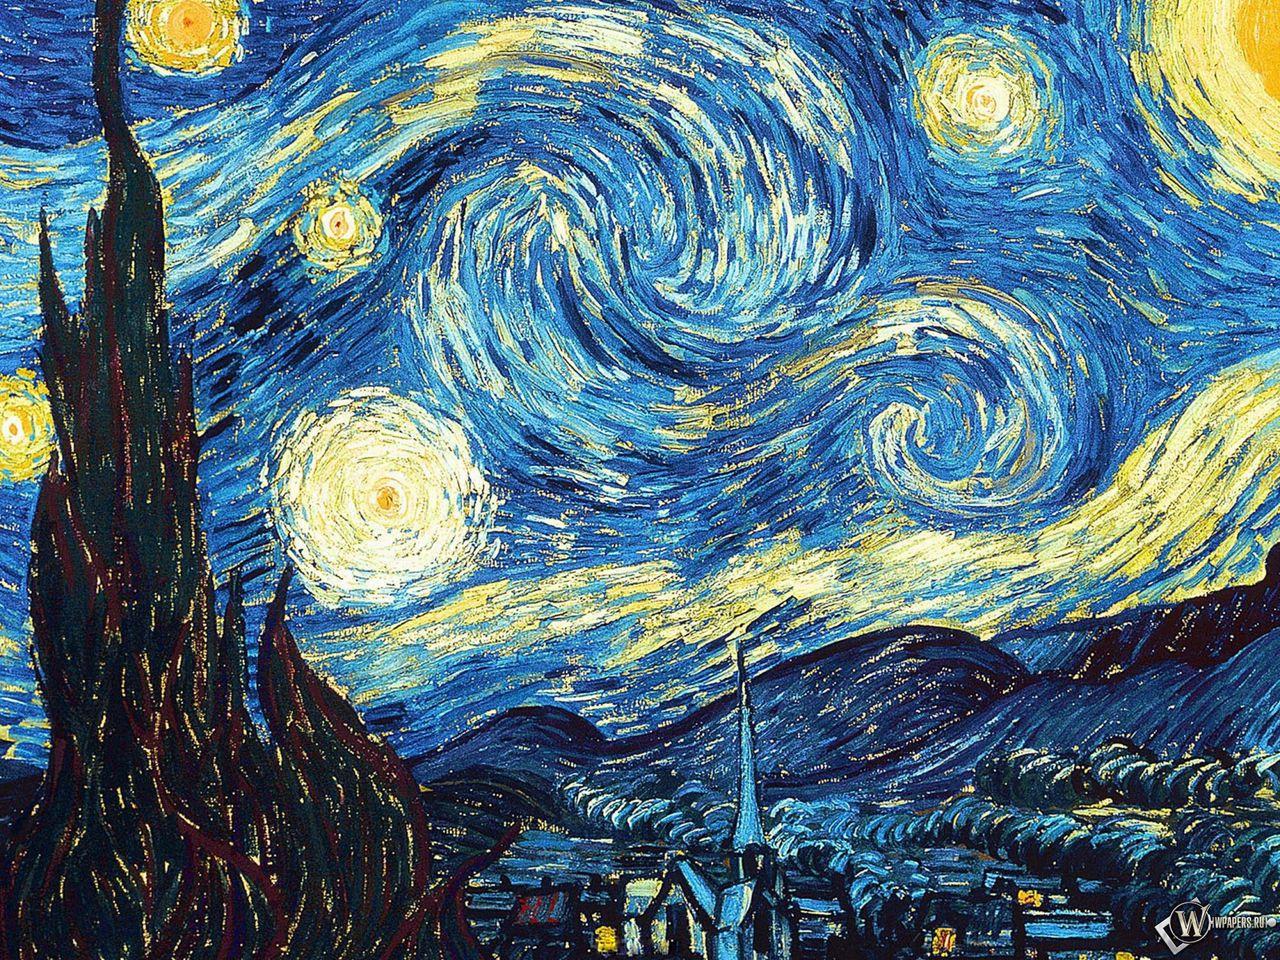 1280x960 Wallpaper vincent van gogh, the starry night, oil, canvas